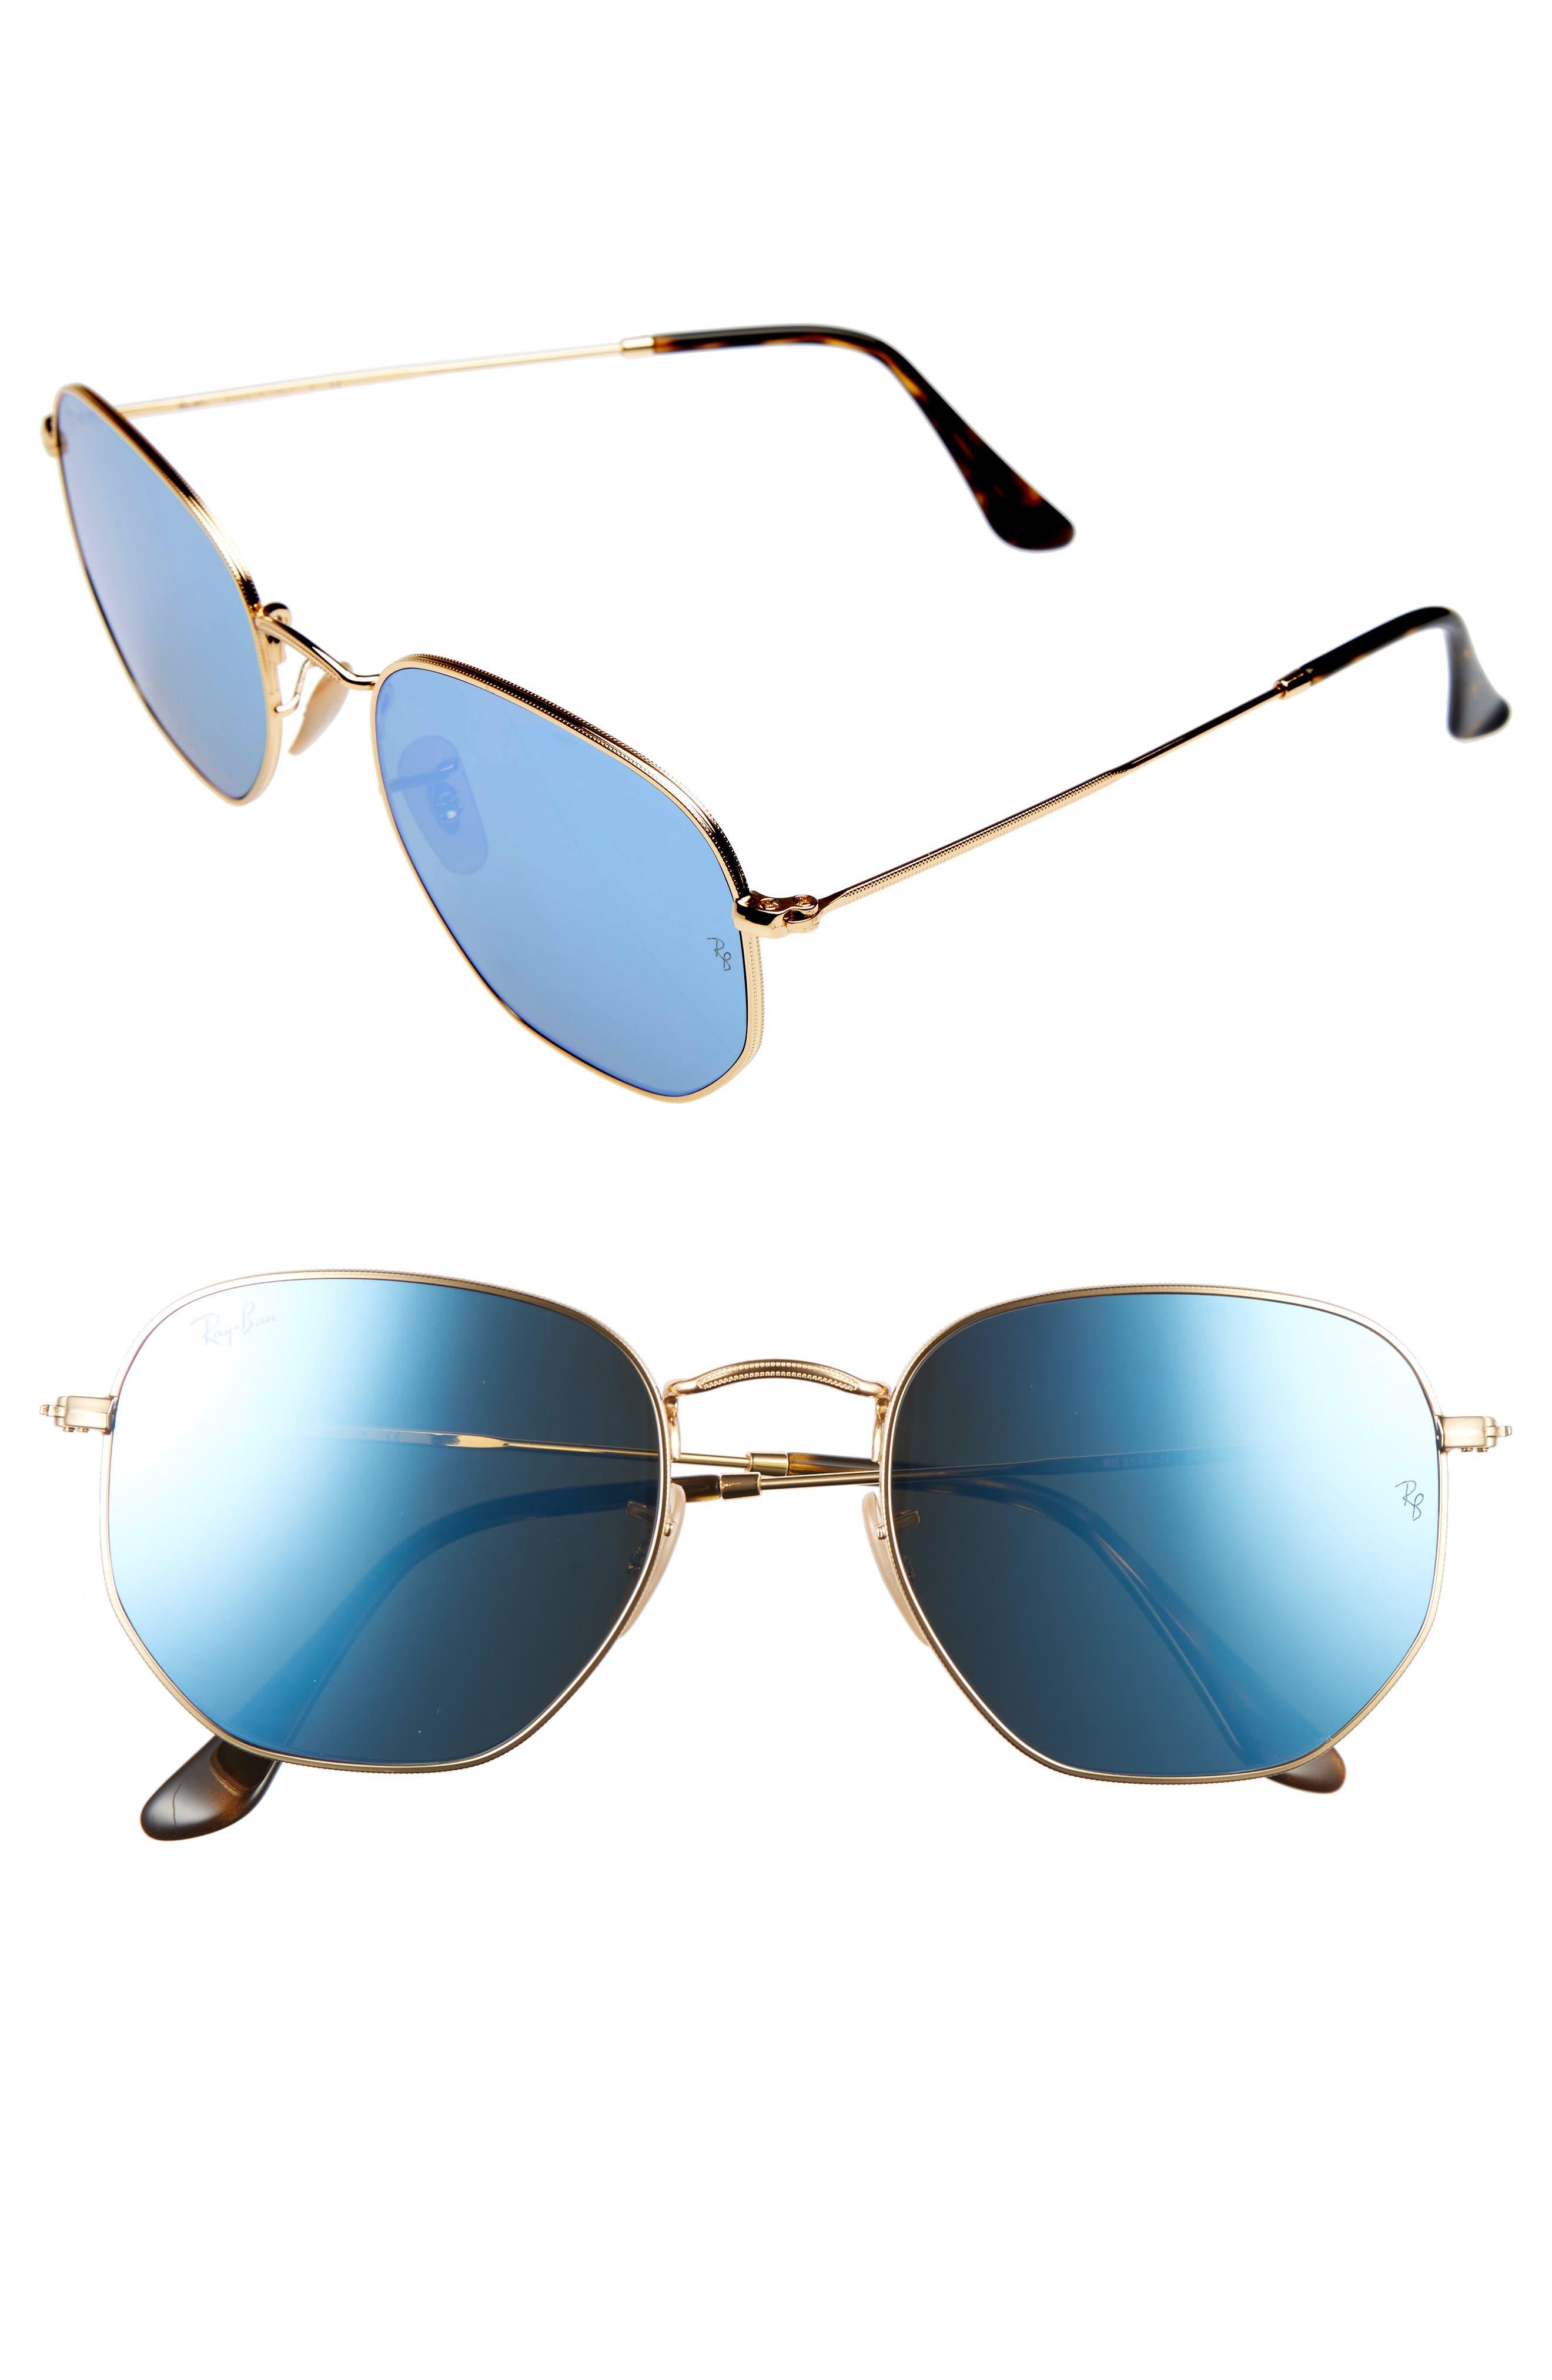 54mm Hexagonal Flat Lens Sunglasses,                         Main,                         color, 708